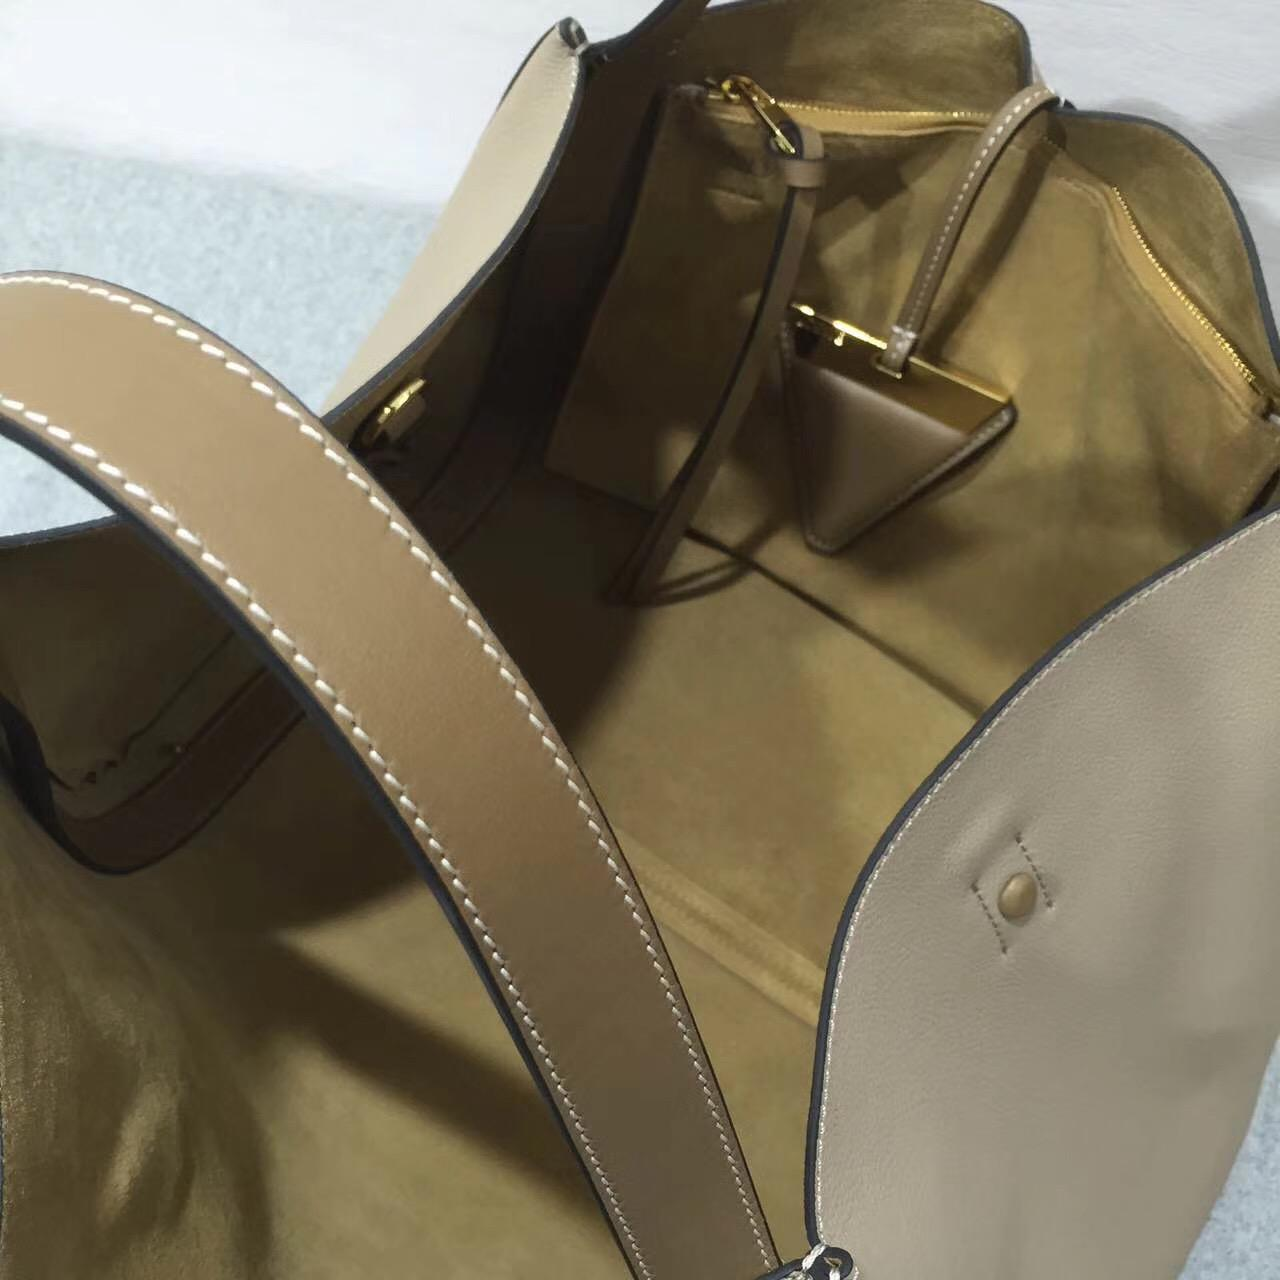 loewe羅意威巴塞羅那包 Barcelona Tote Bag 灰色日常旅行袋